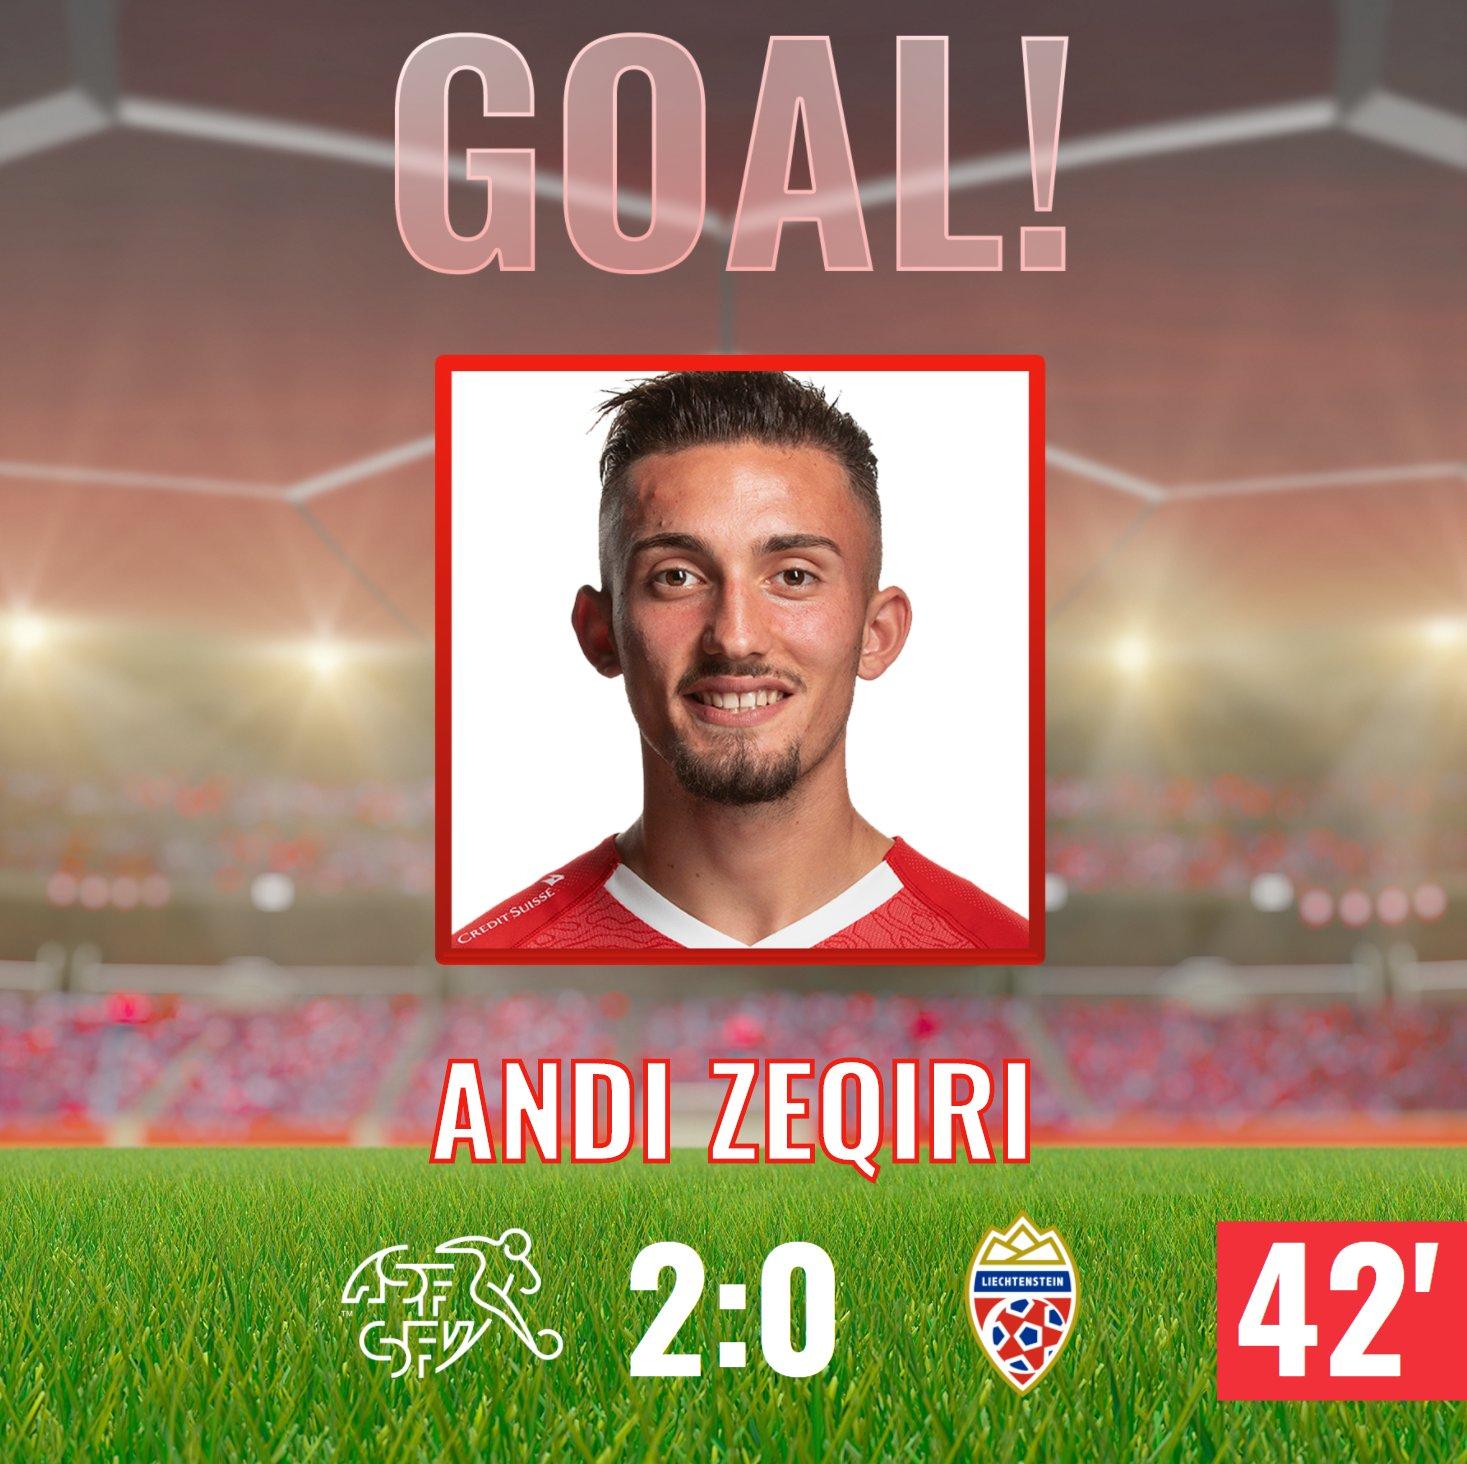 Andi Zeqiri hot on heels of England ace in Euro goals chart